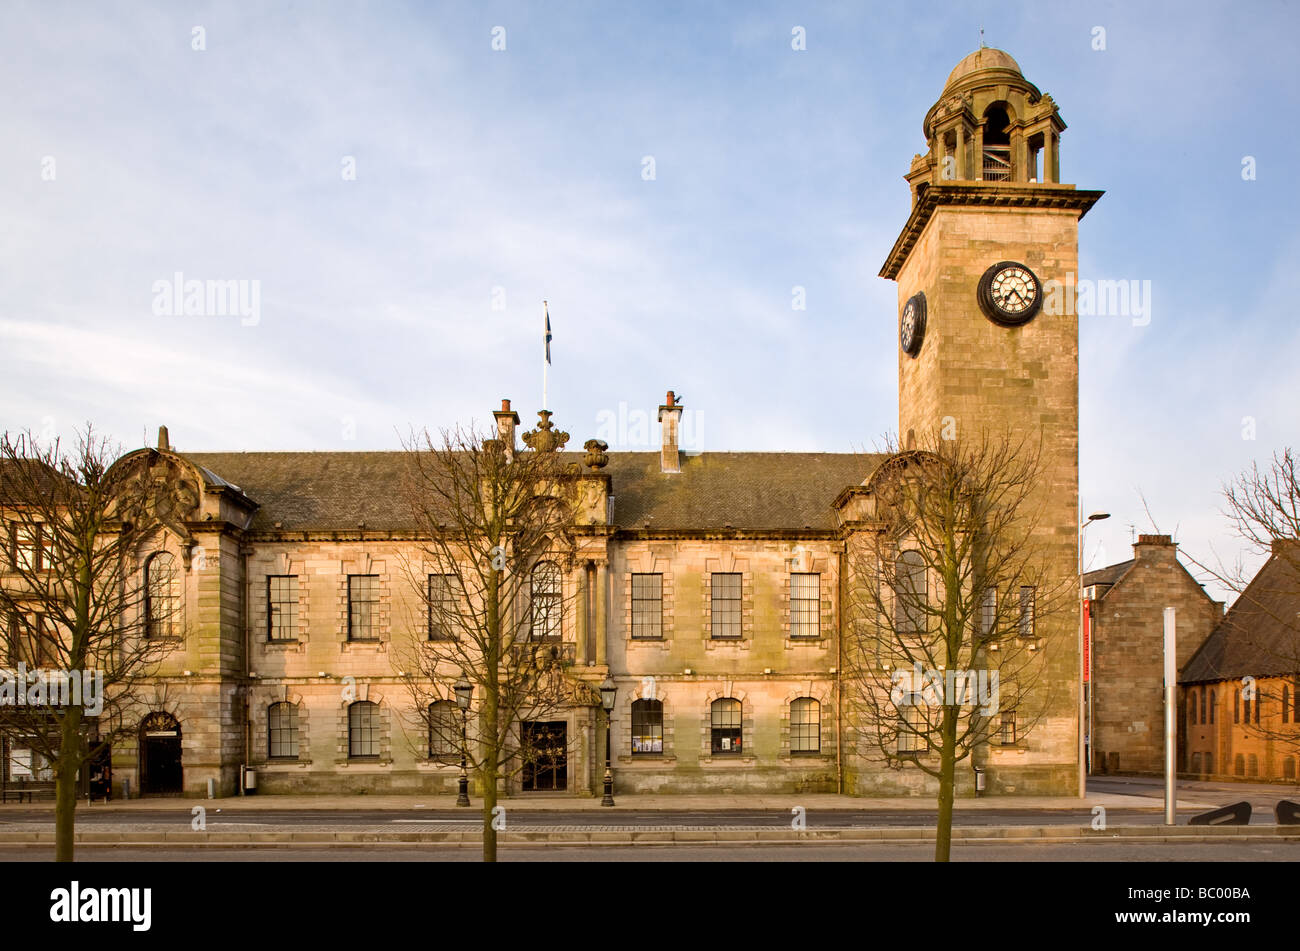 Clydebank Town Hall, Clydebank, Scotland. - Stock Image